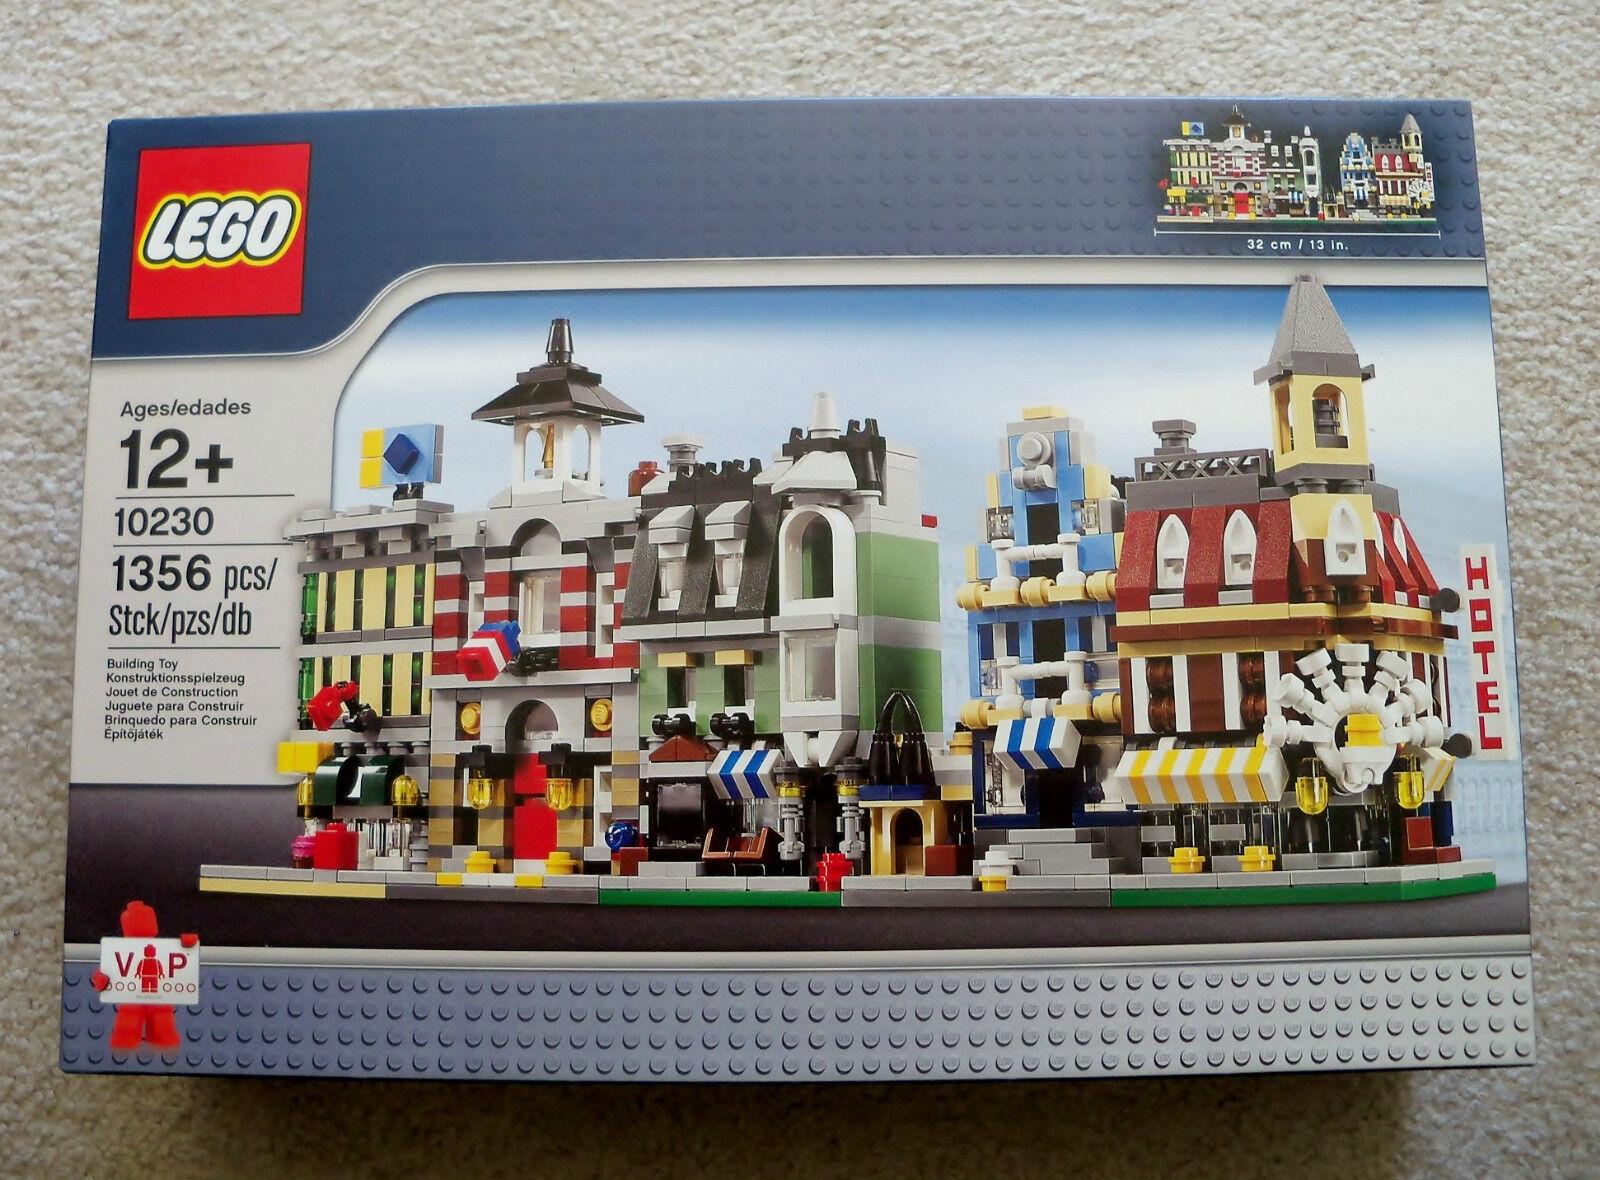 LEGO Creator Modular Modular Modular Buildings - 10230 Mini Modulars - New & Sealed ebb65b